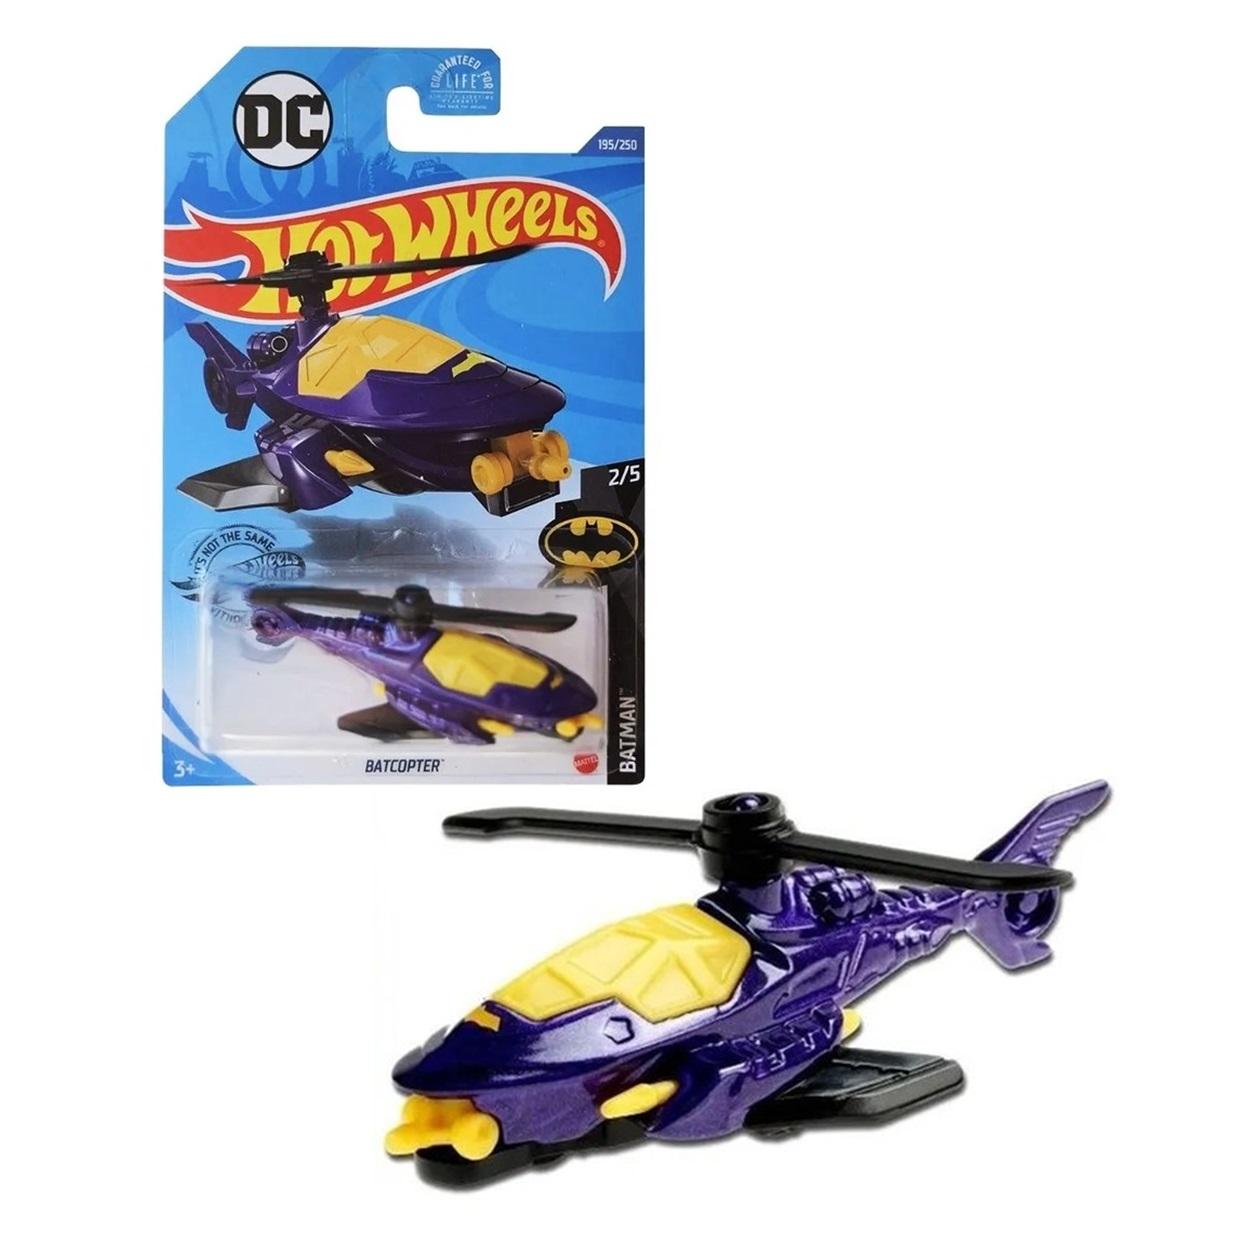 Batcopter Fkvsy 2/5 Hot Wheels Batman Dc Comics 195/250